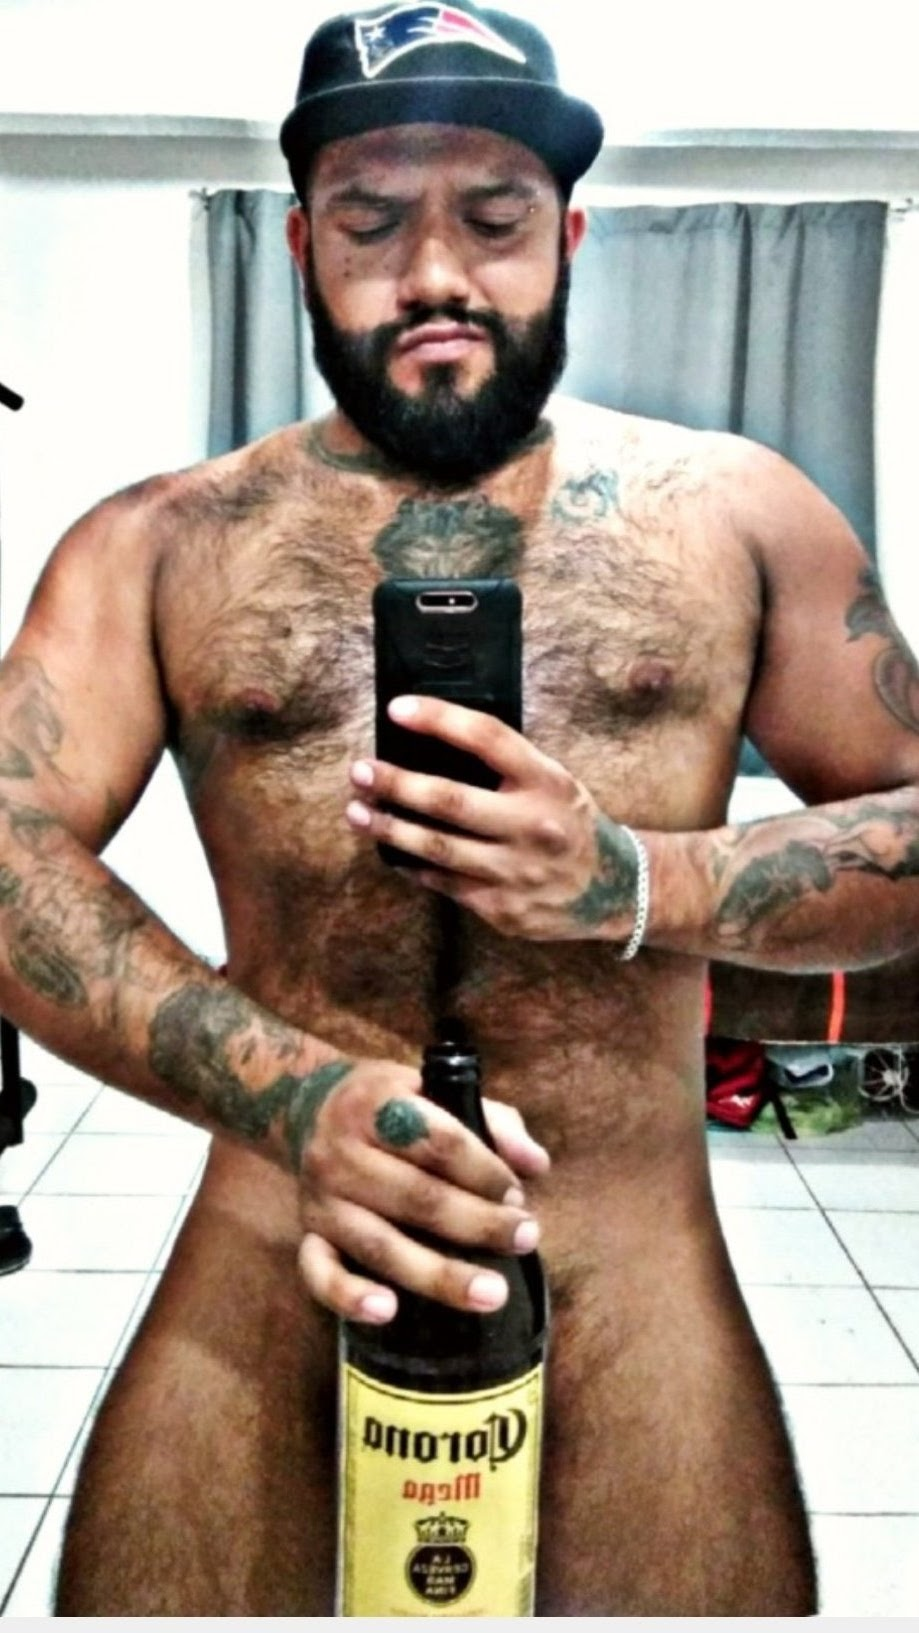 el tatuador desnudo